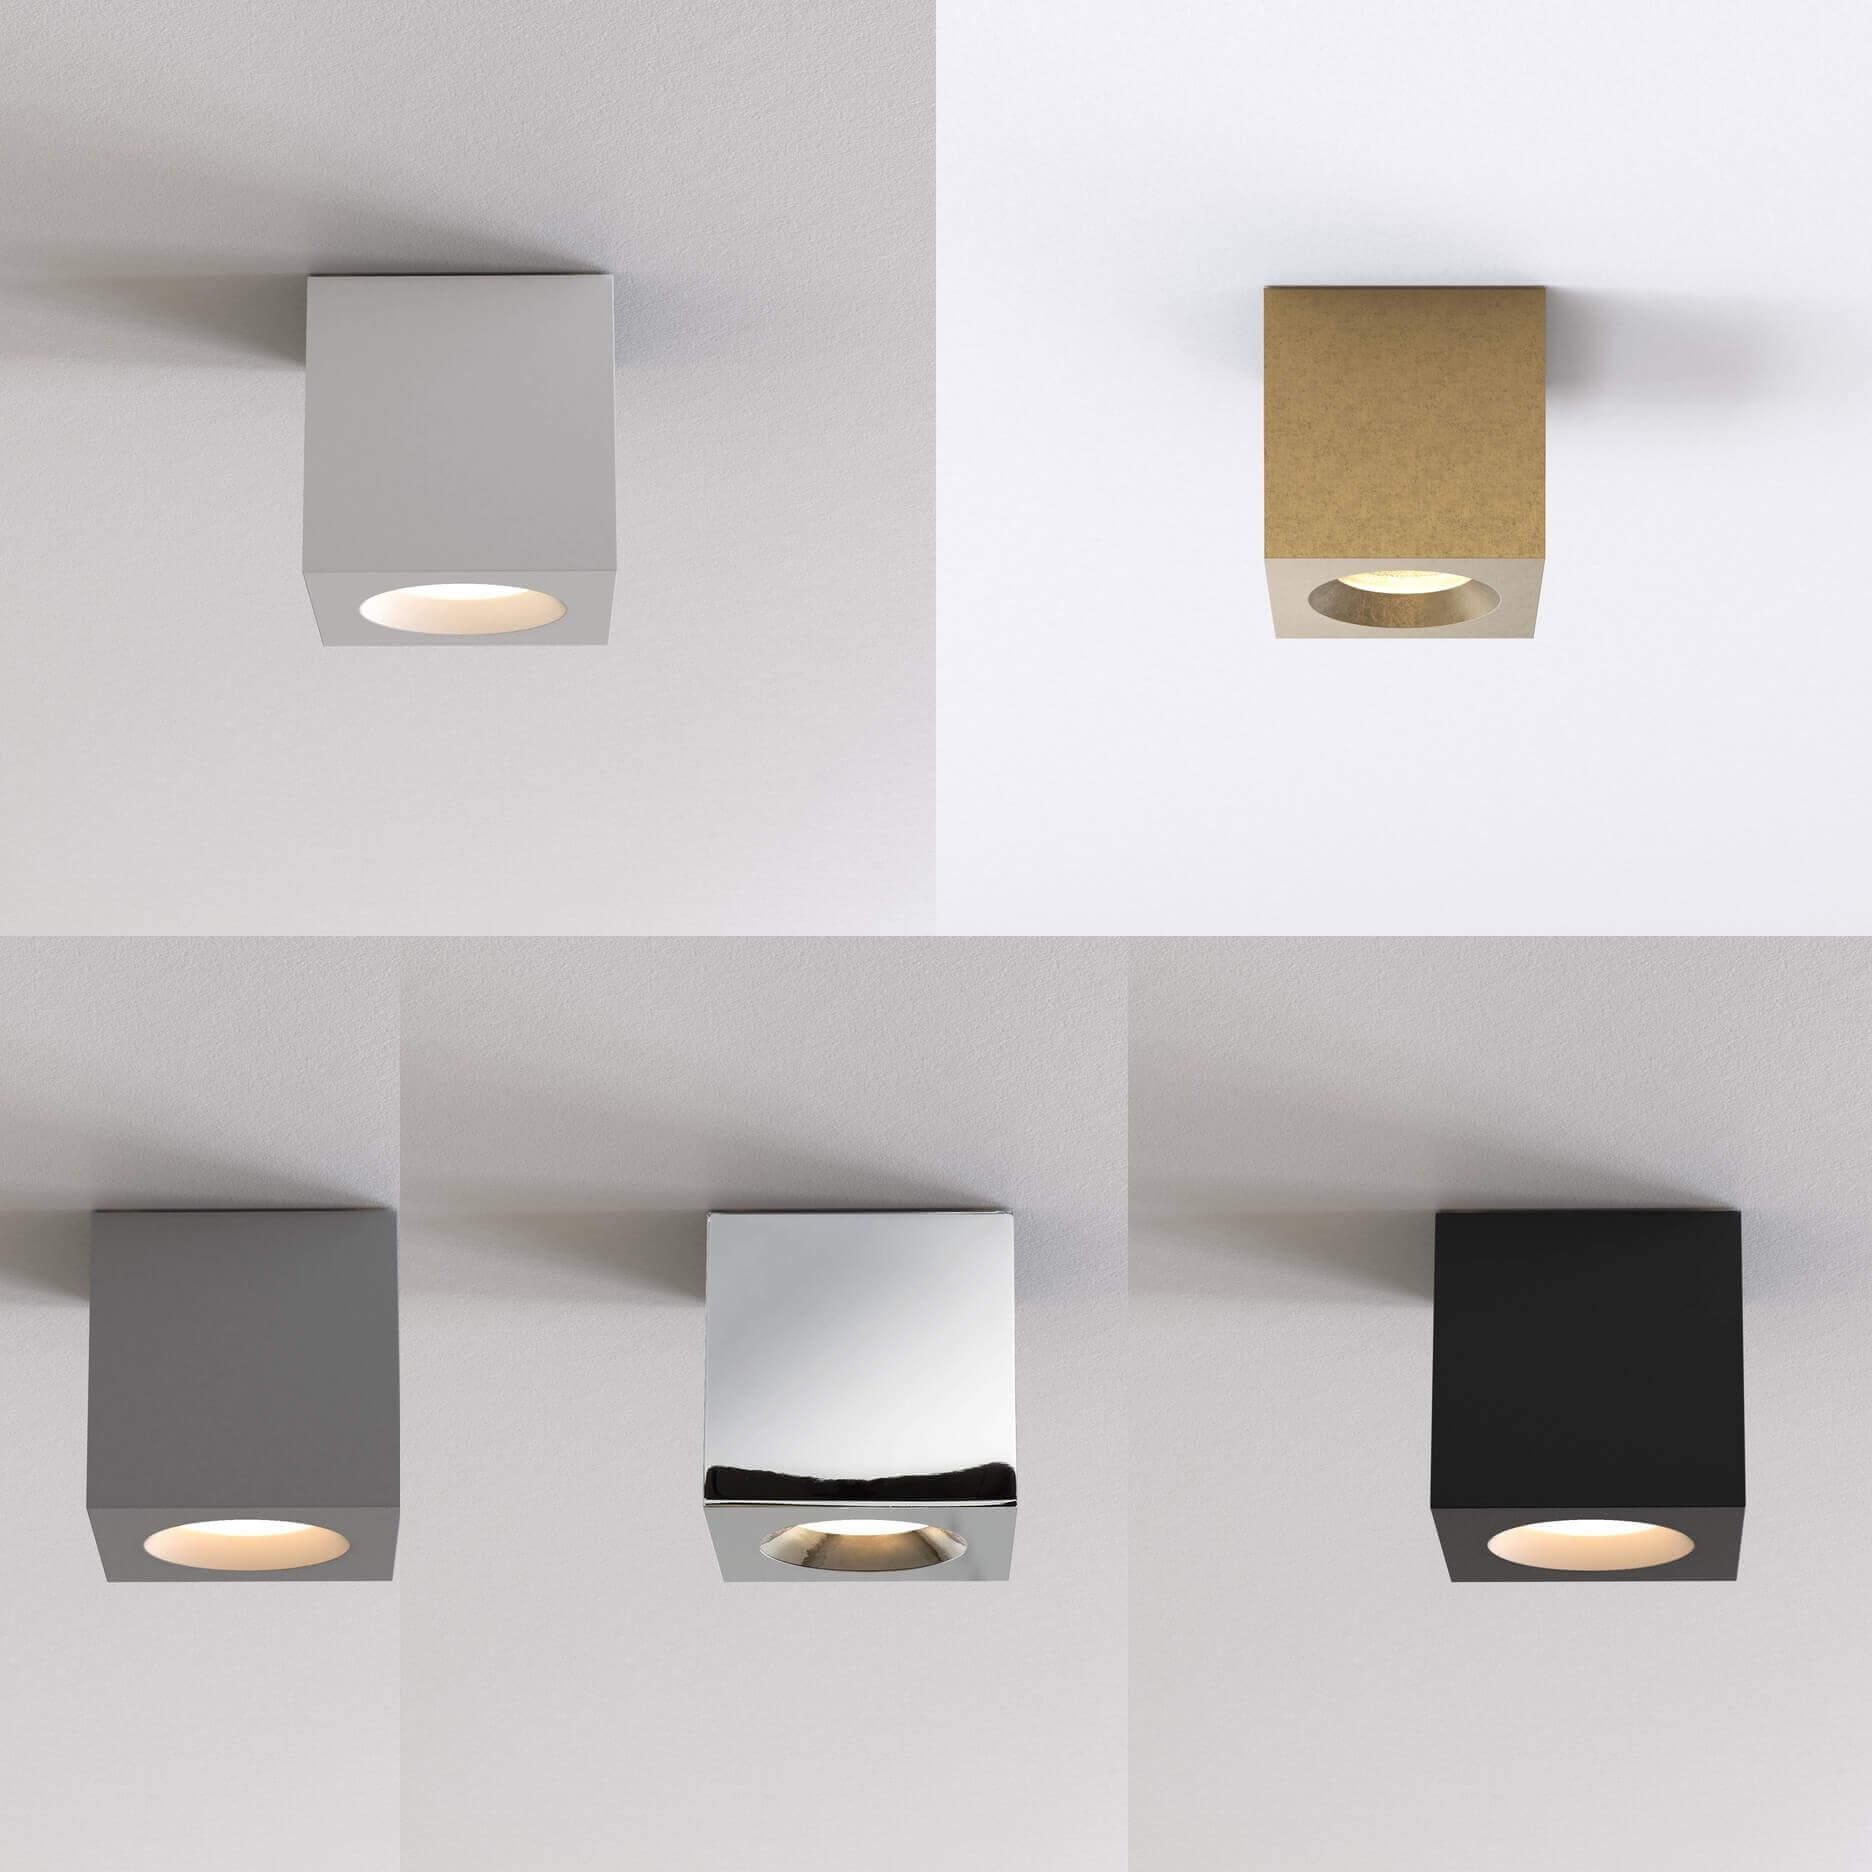 kwadratowa lampa do łazienki IP65